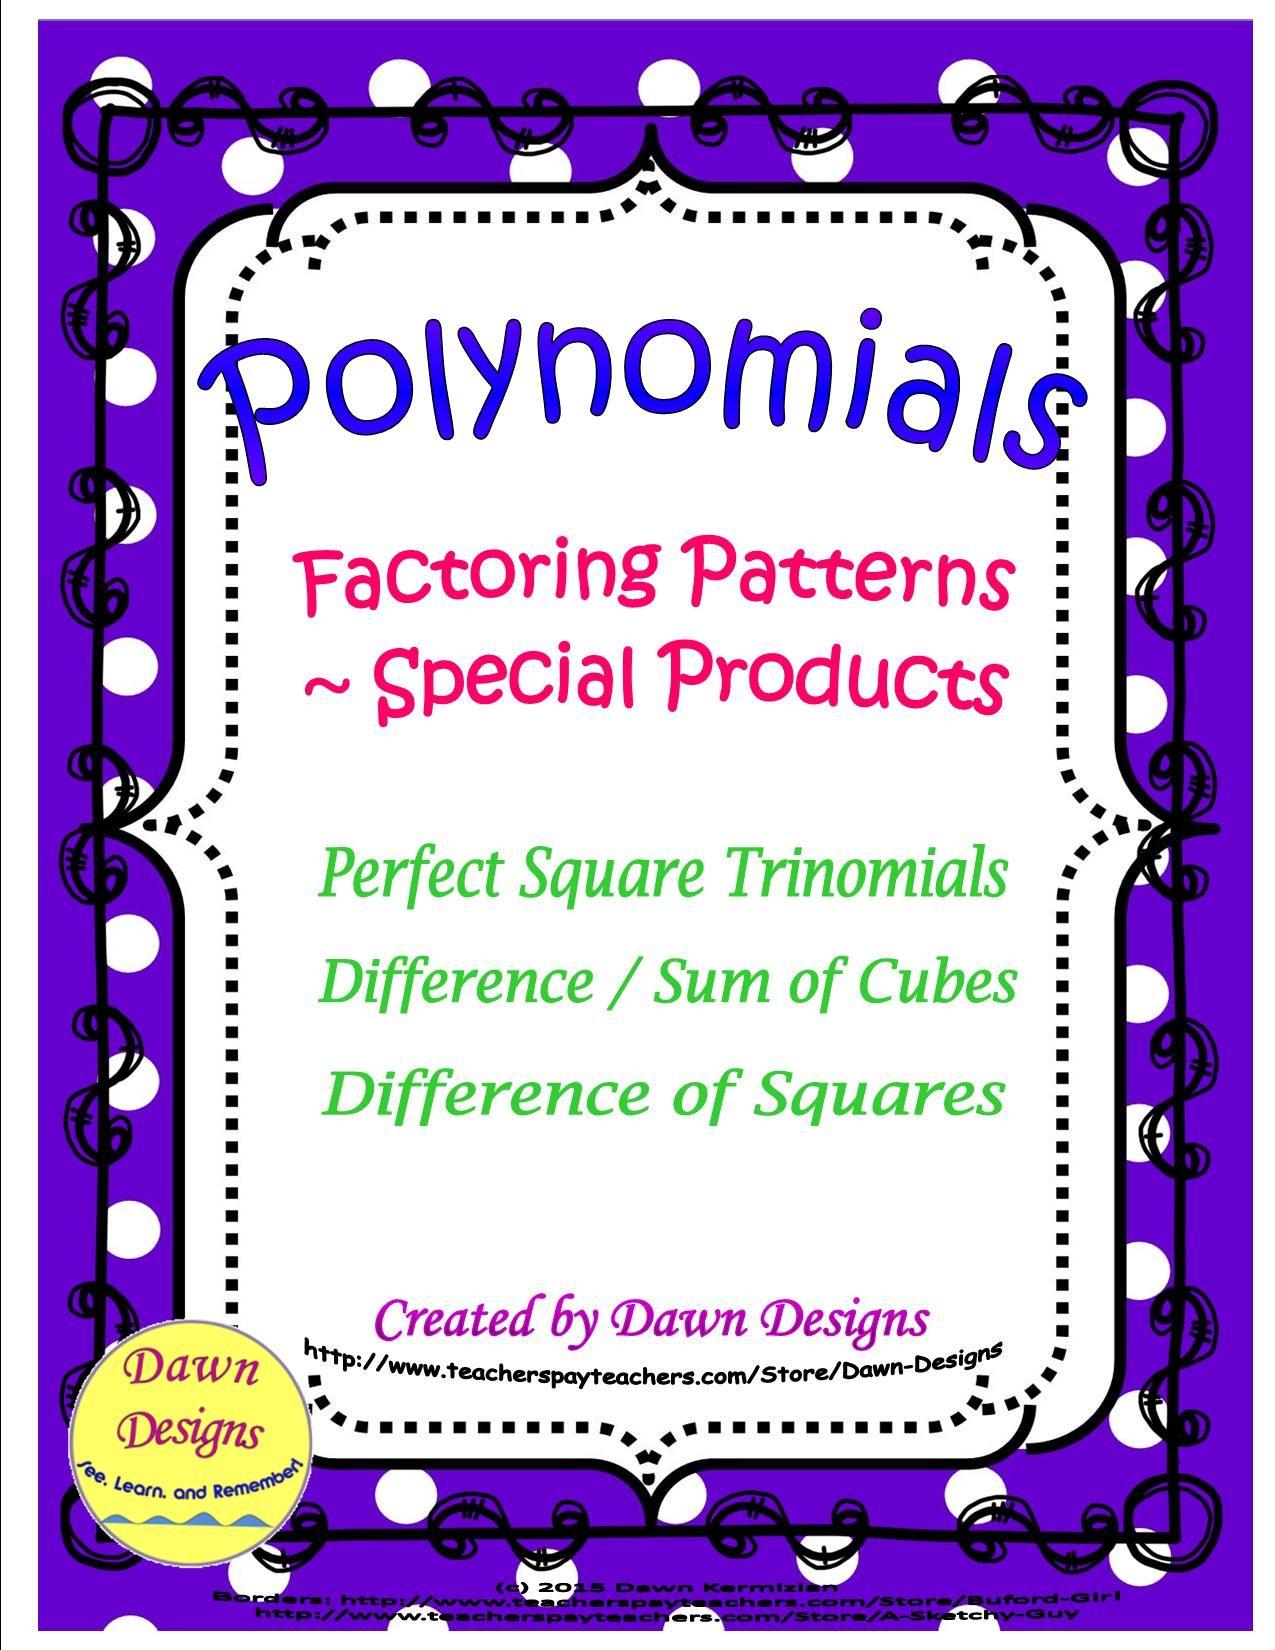 Polynomials Factoring Patterns